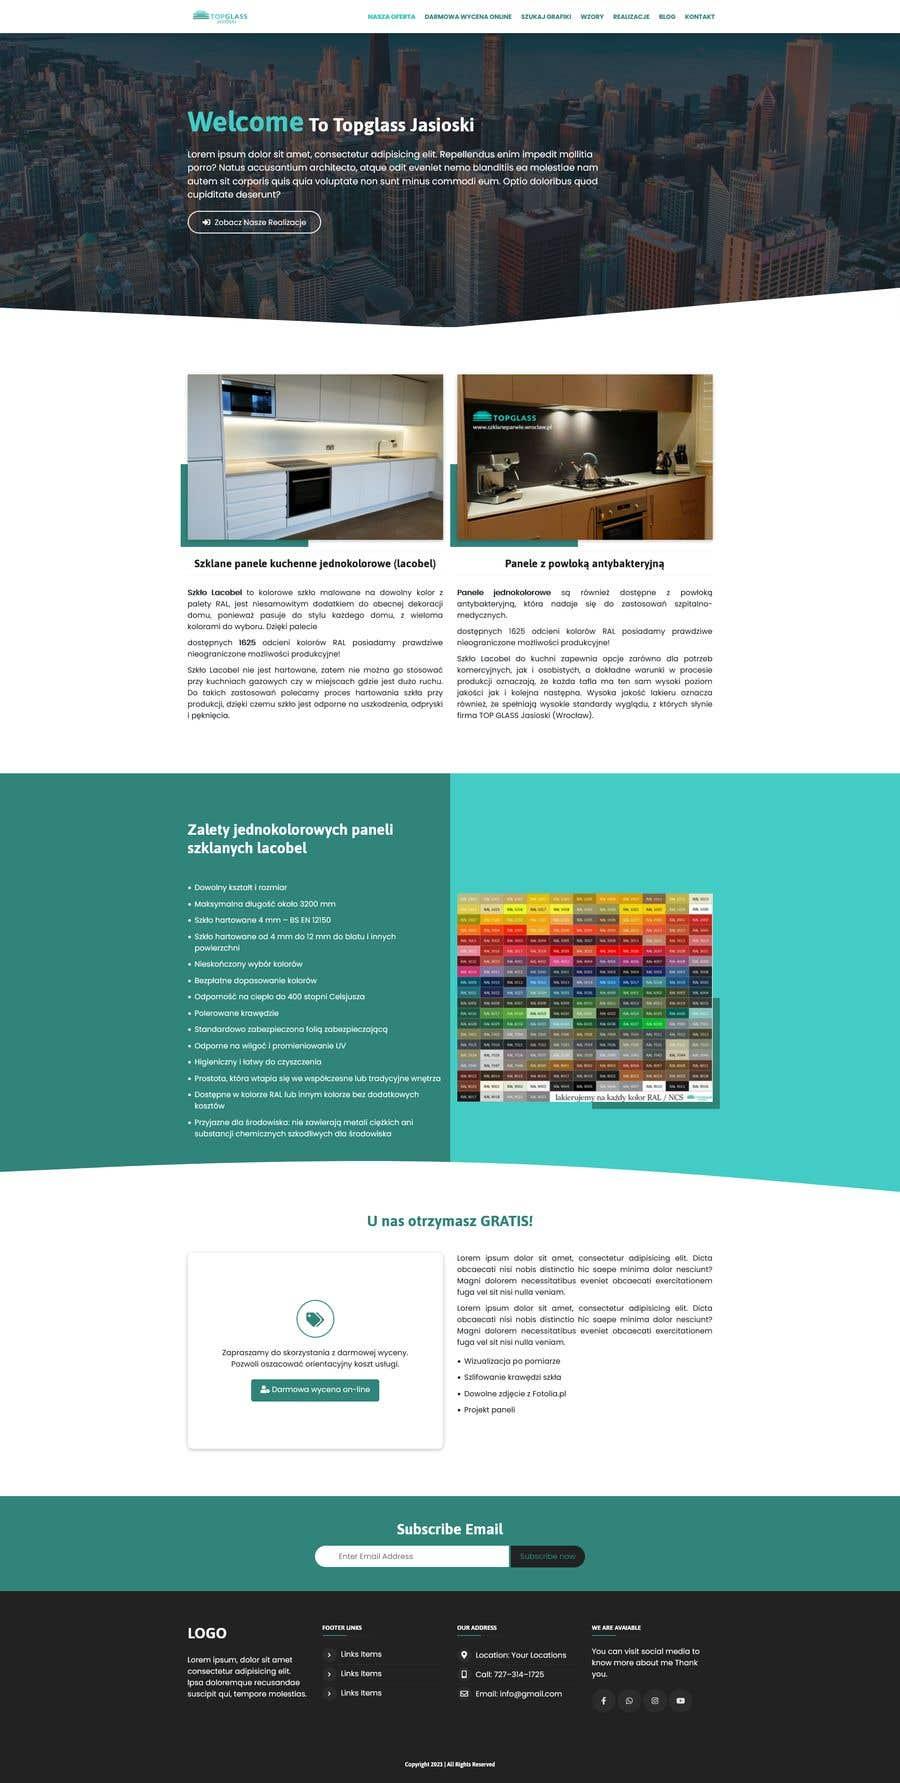 Proposition n°                                        3                                      du concours                                         Re-design website for easier UX and UI